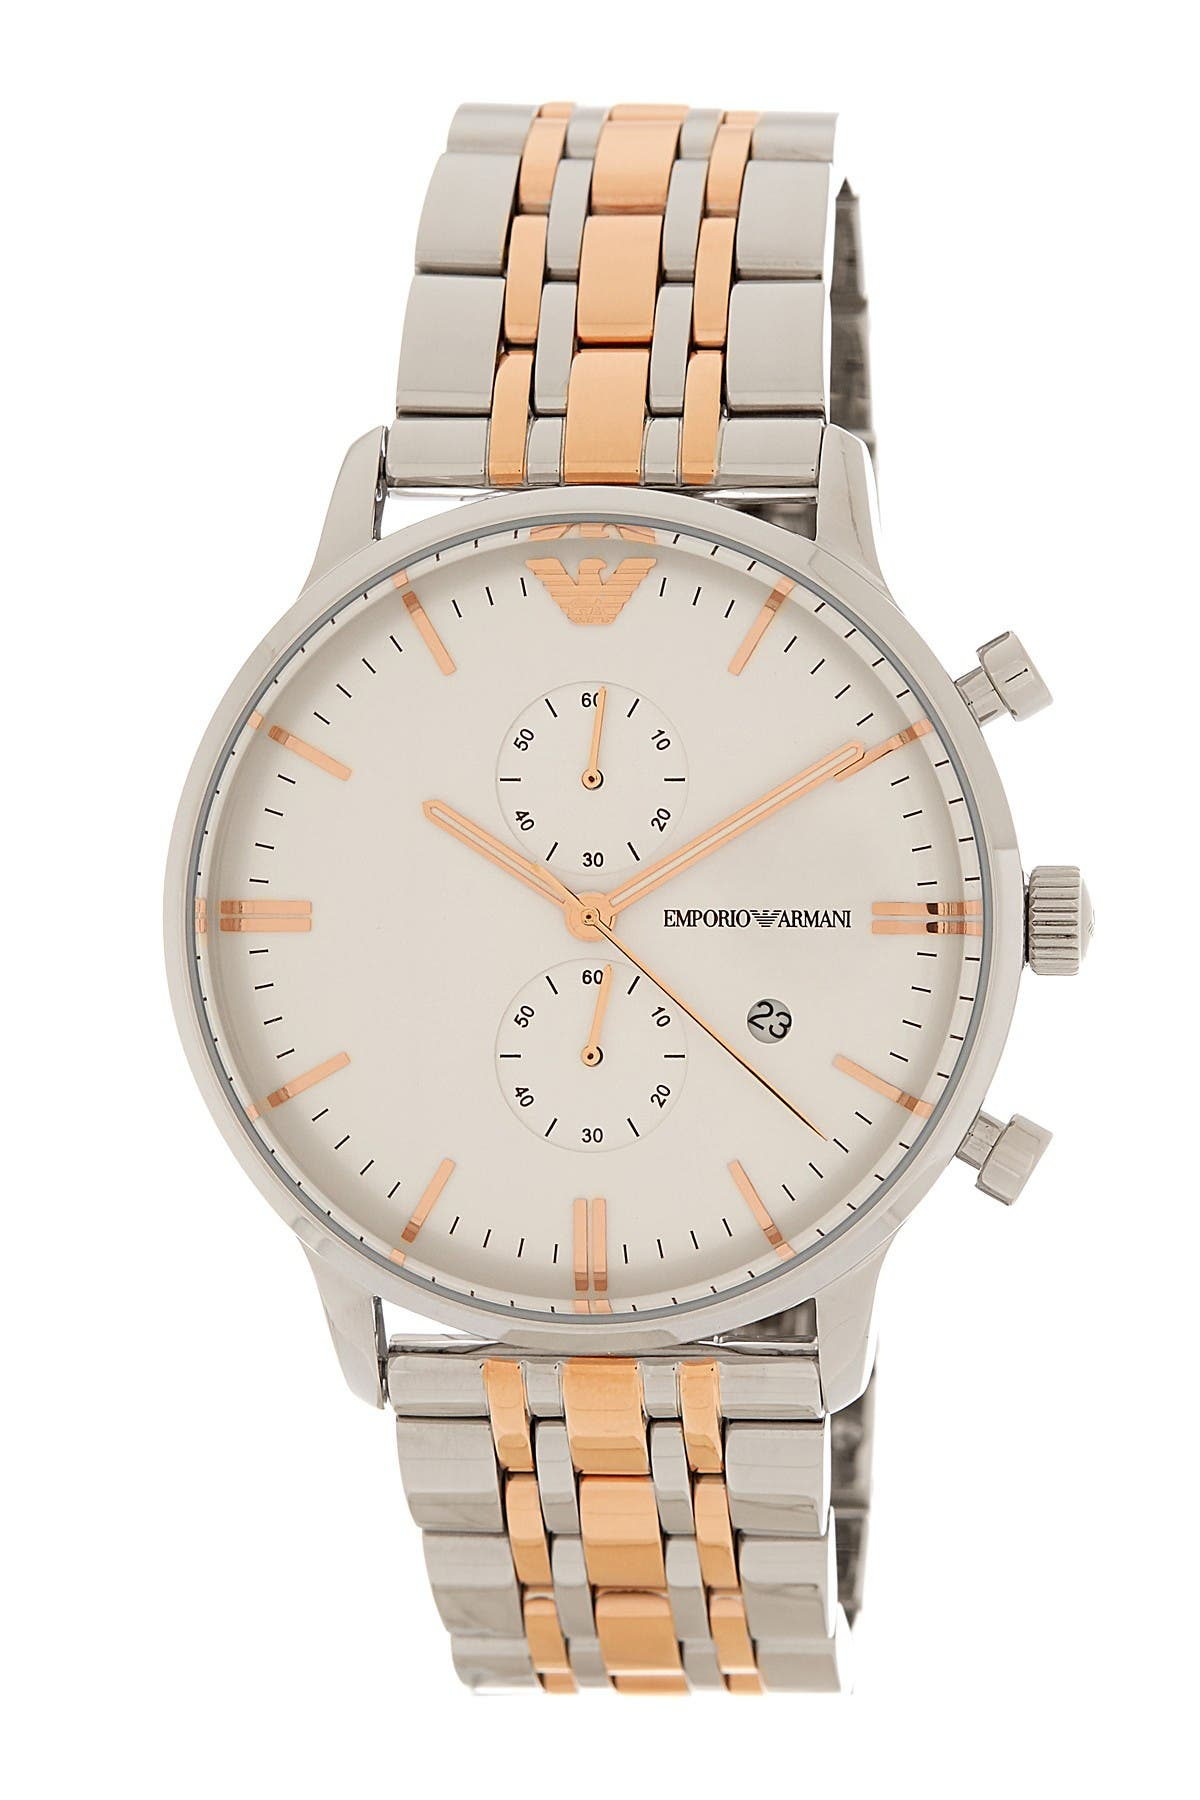 Image of Emporio Armani Men's Two-Tone Bracelet Watch, 43mm